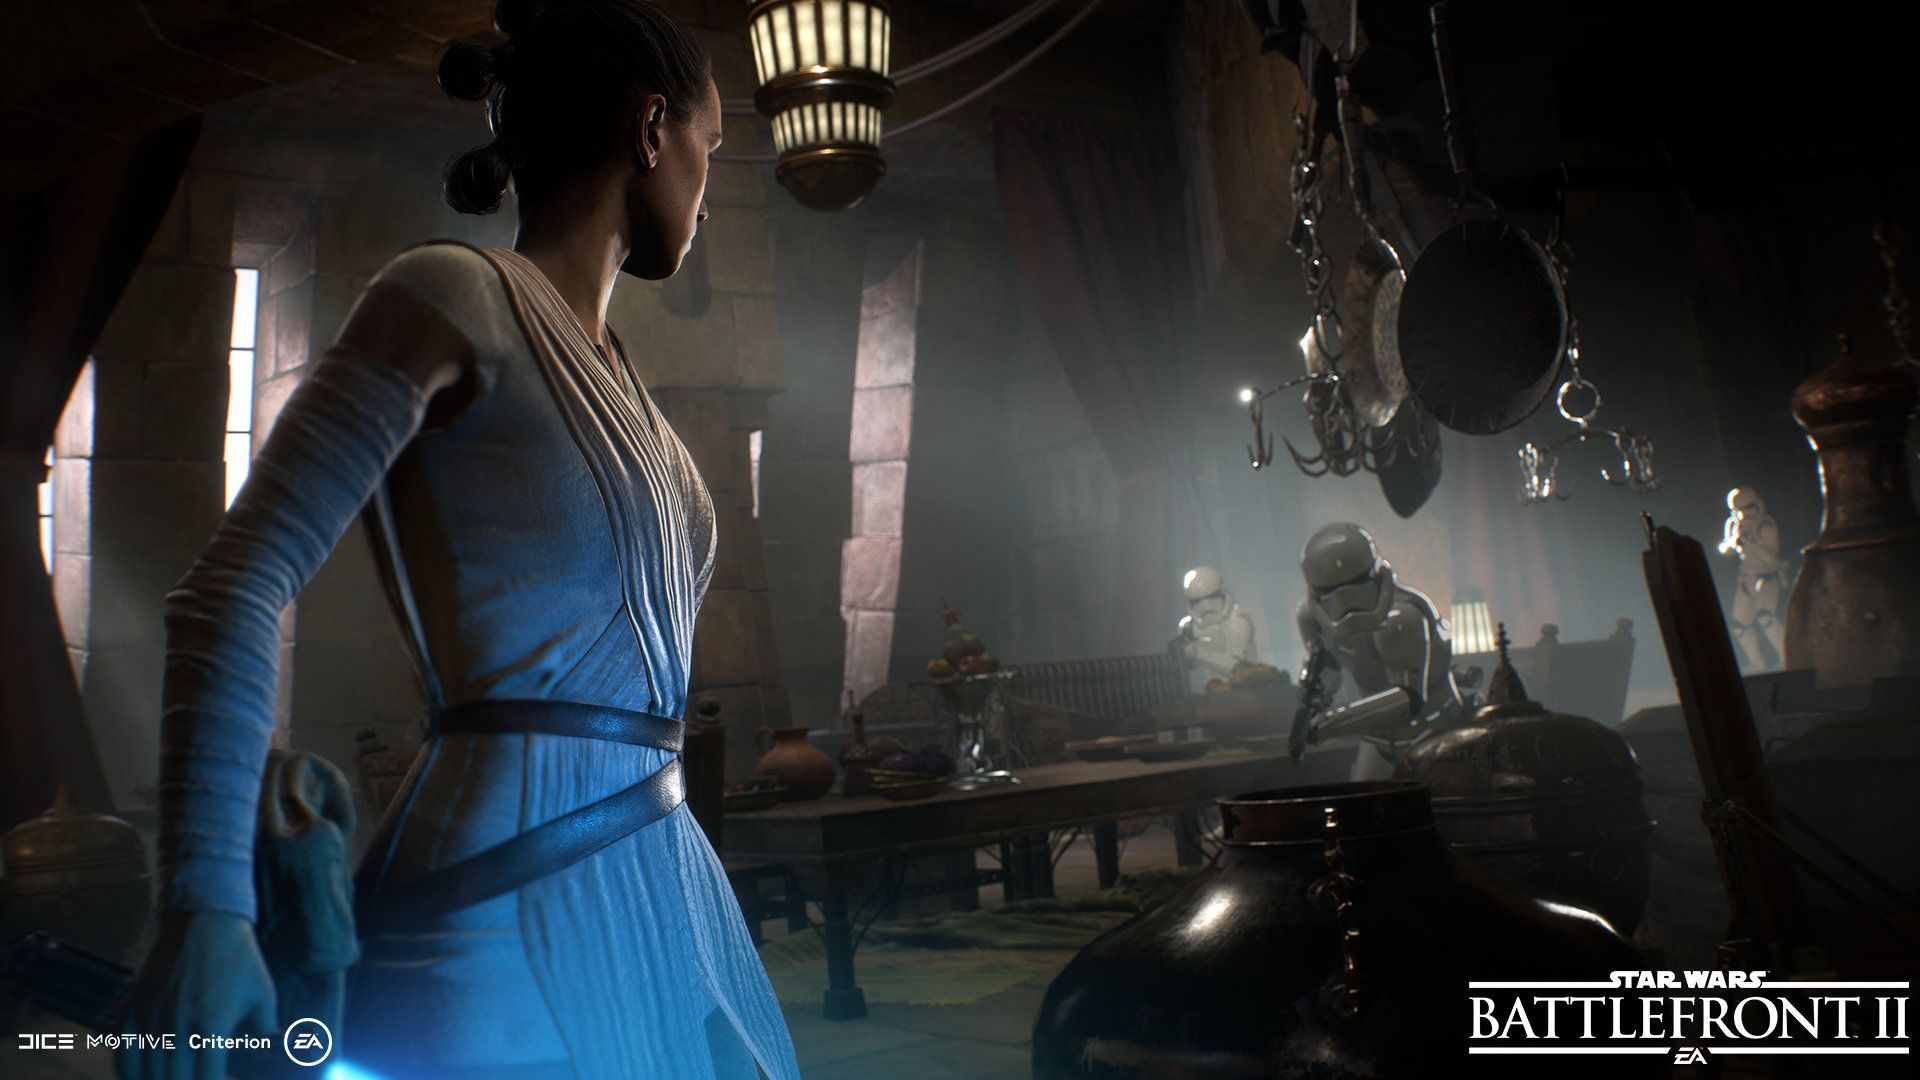 PS4 Game Star wars battlefront, Star wars video games